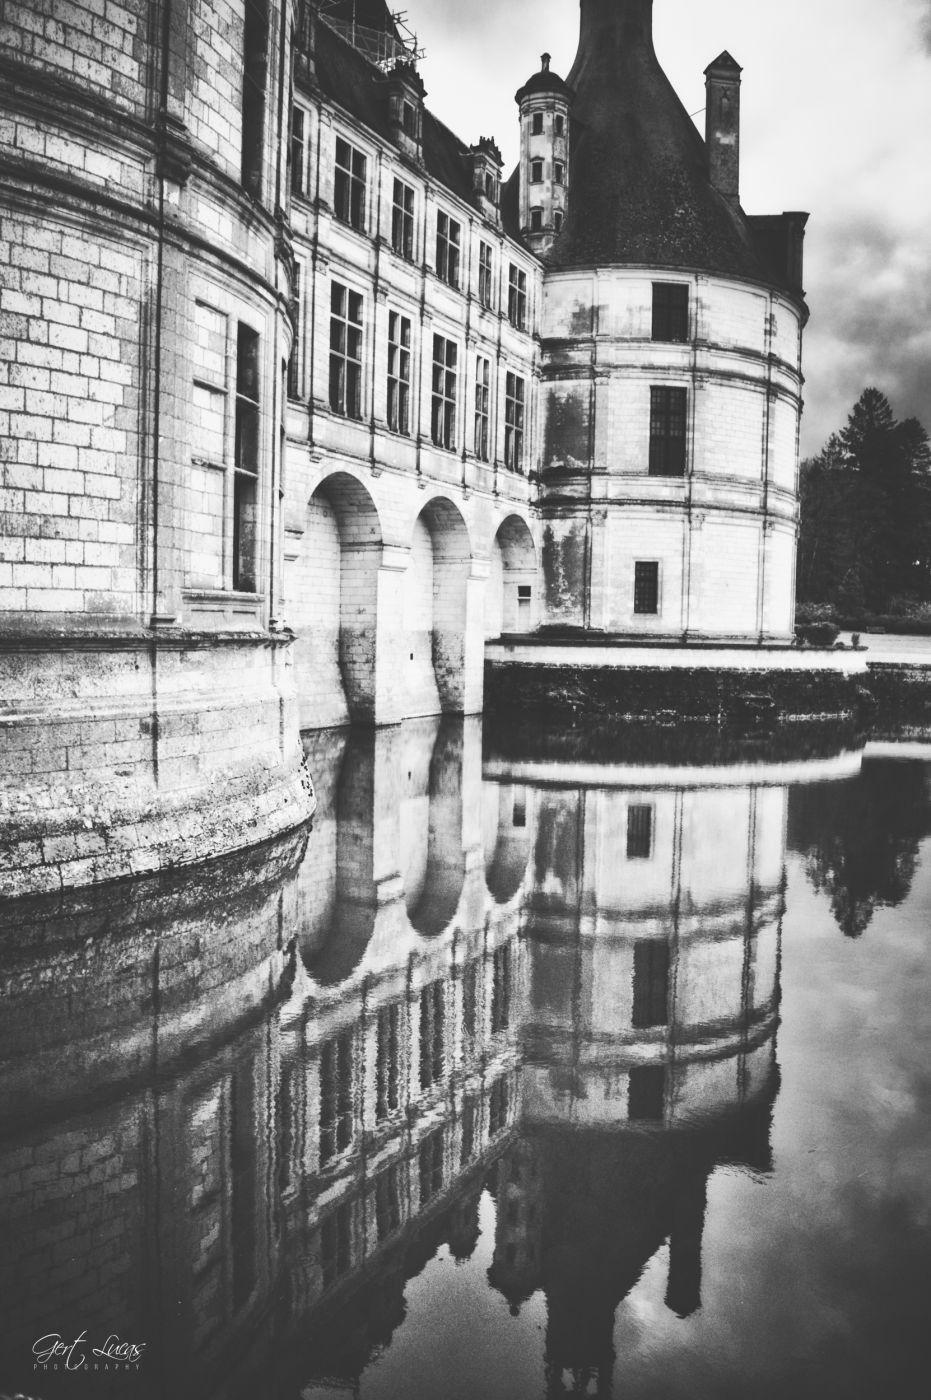 Chambord Reflection, France